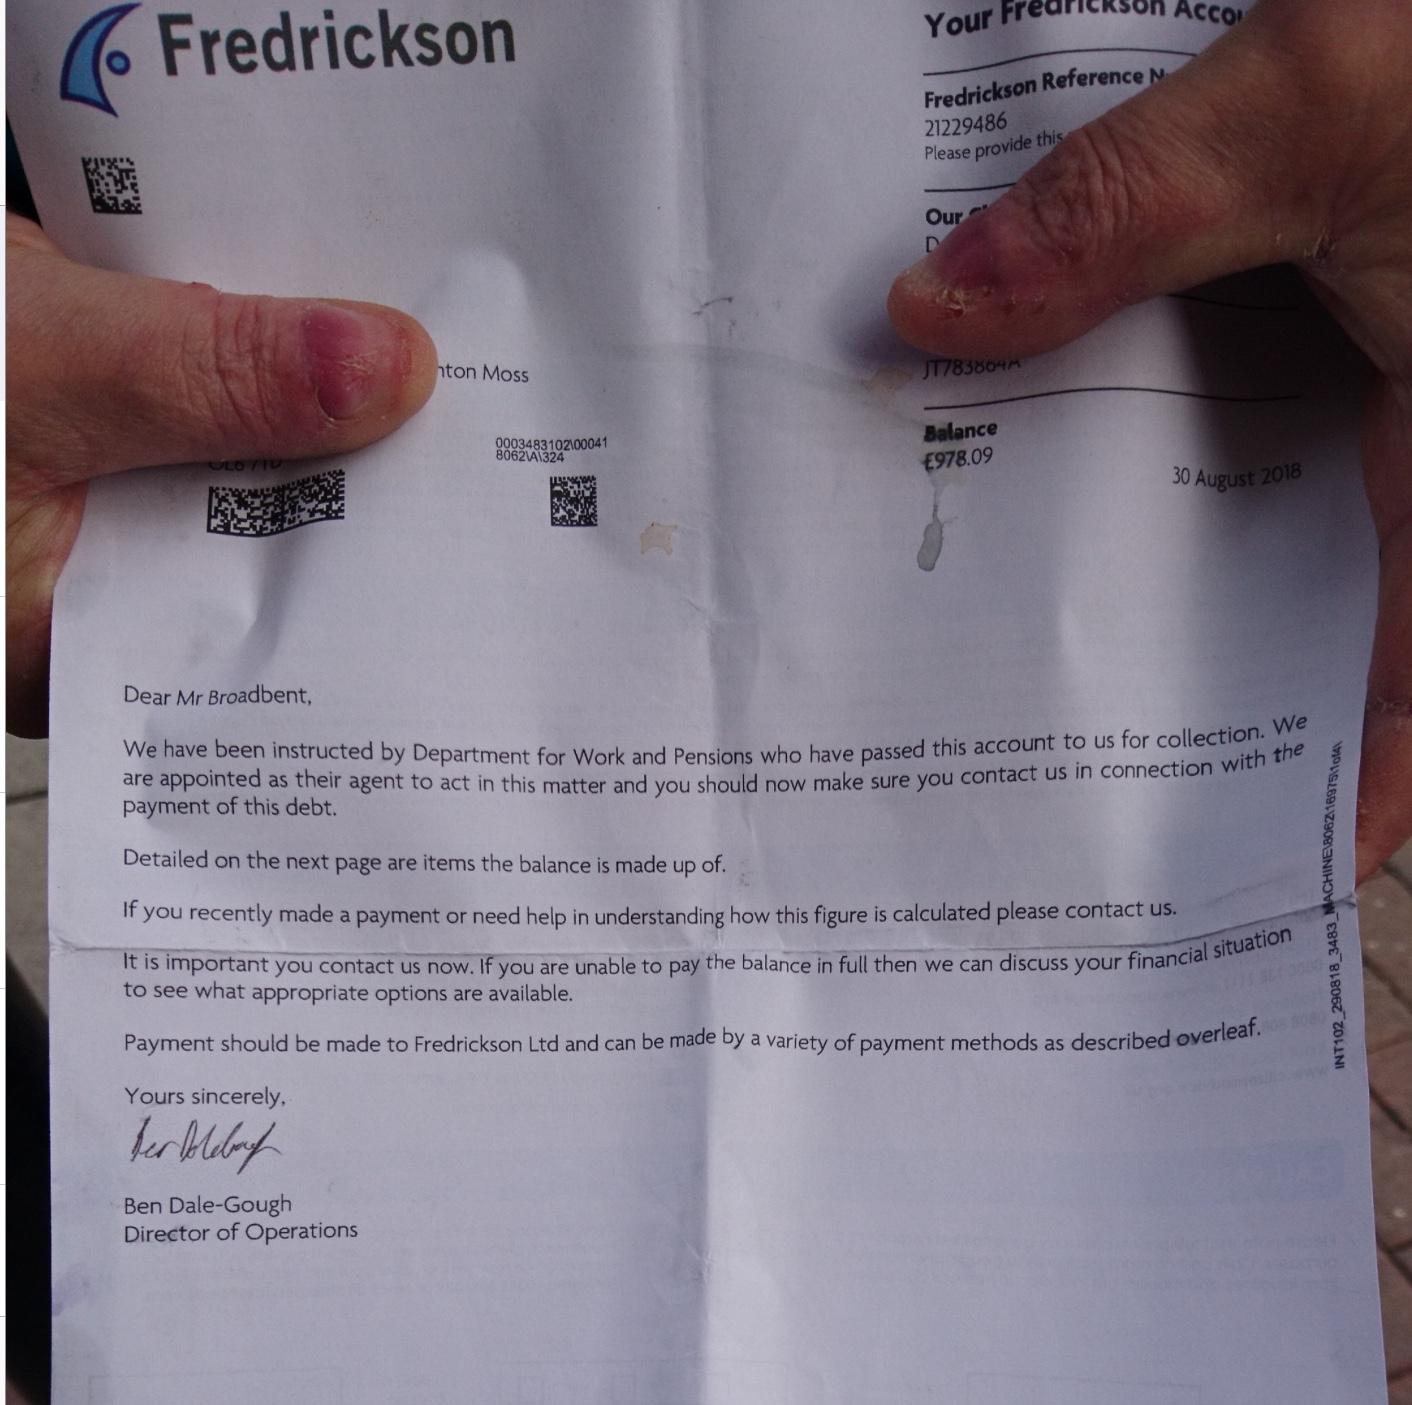 Fredrickson Debt Collection >> Debt Collection Agencies Contracted To Collect So Called